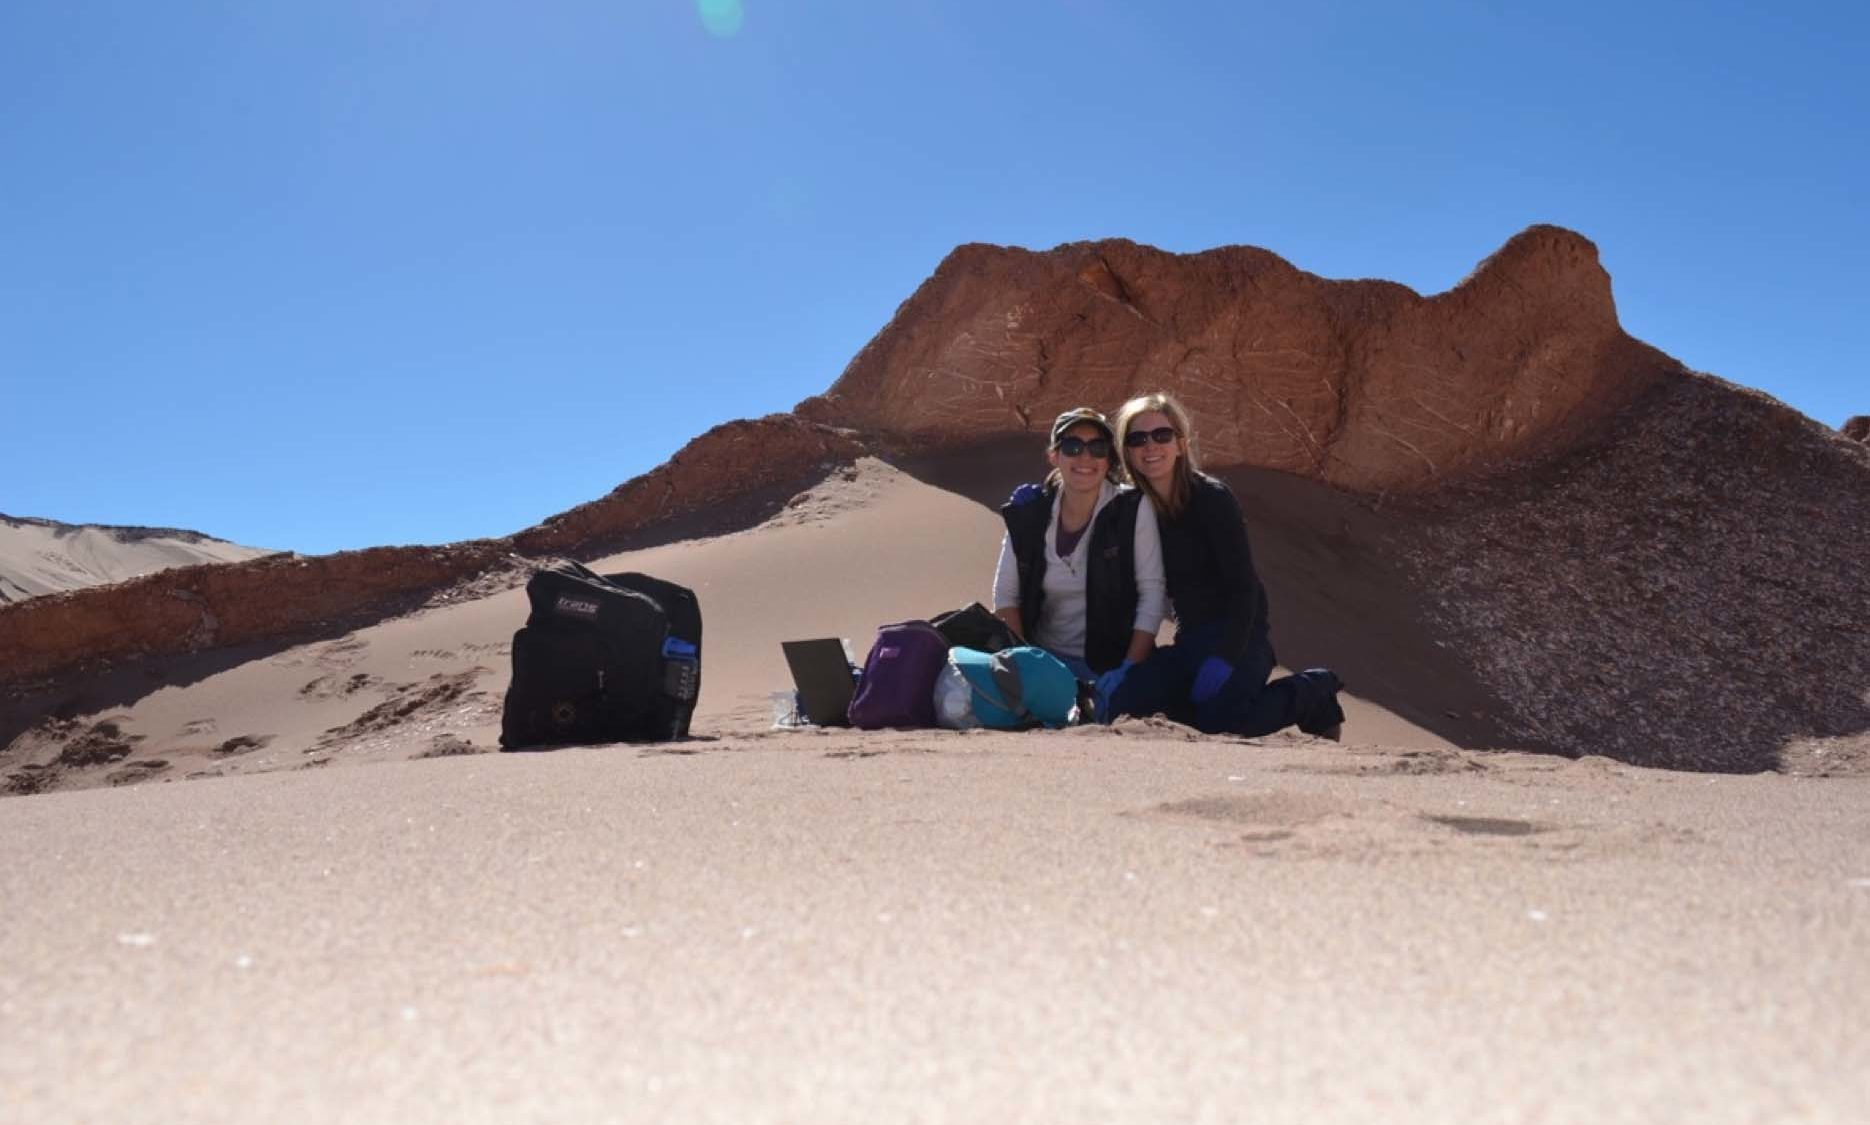 STIA Assistant Professor Sarah Stewart Johnson with an undergraduate student